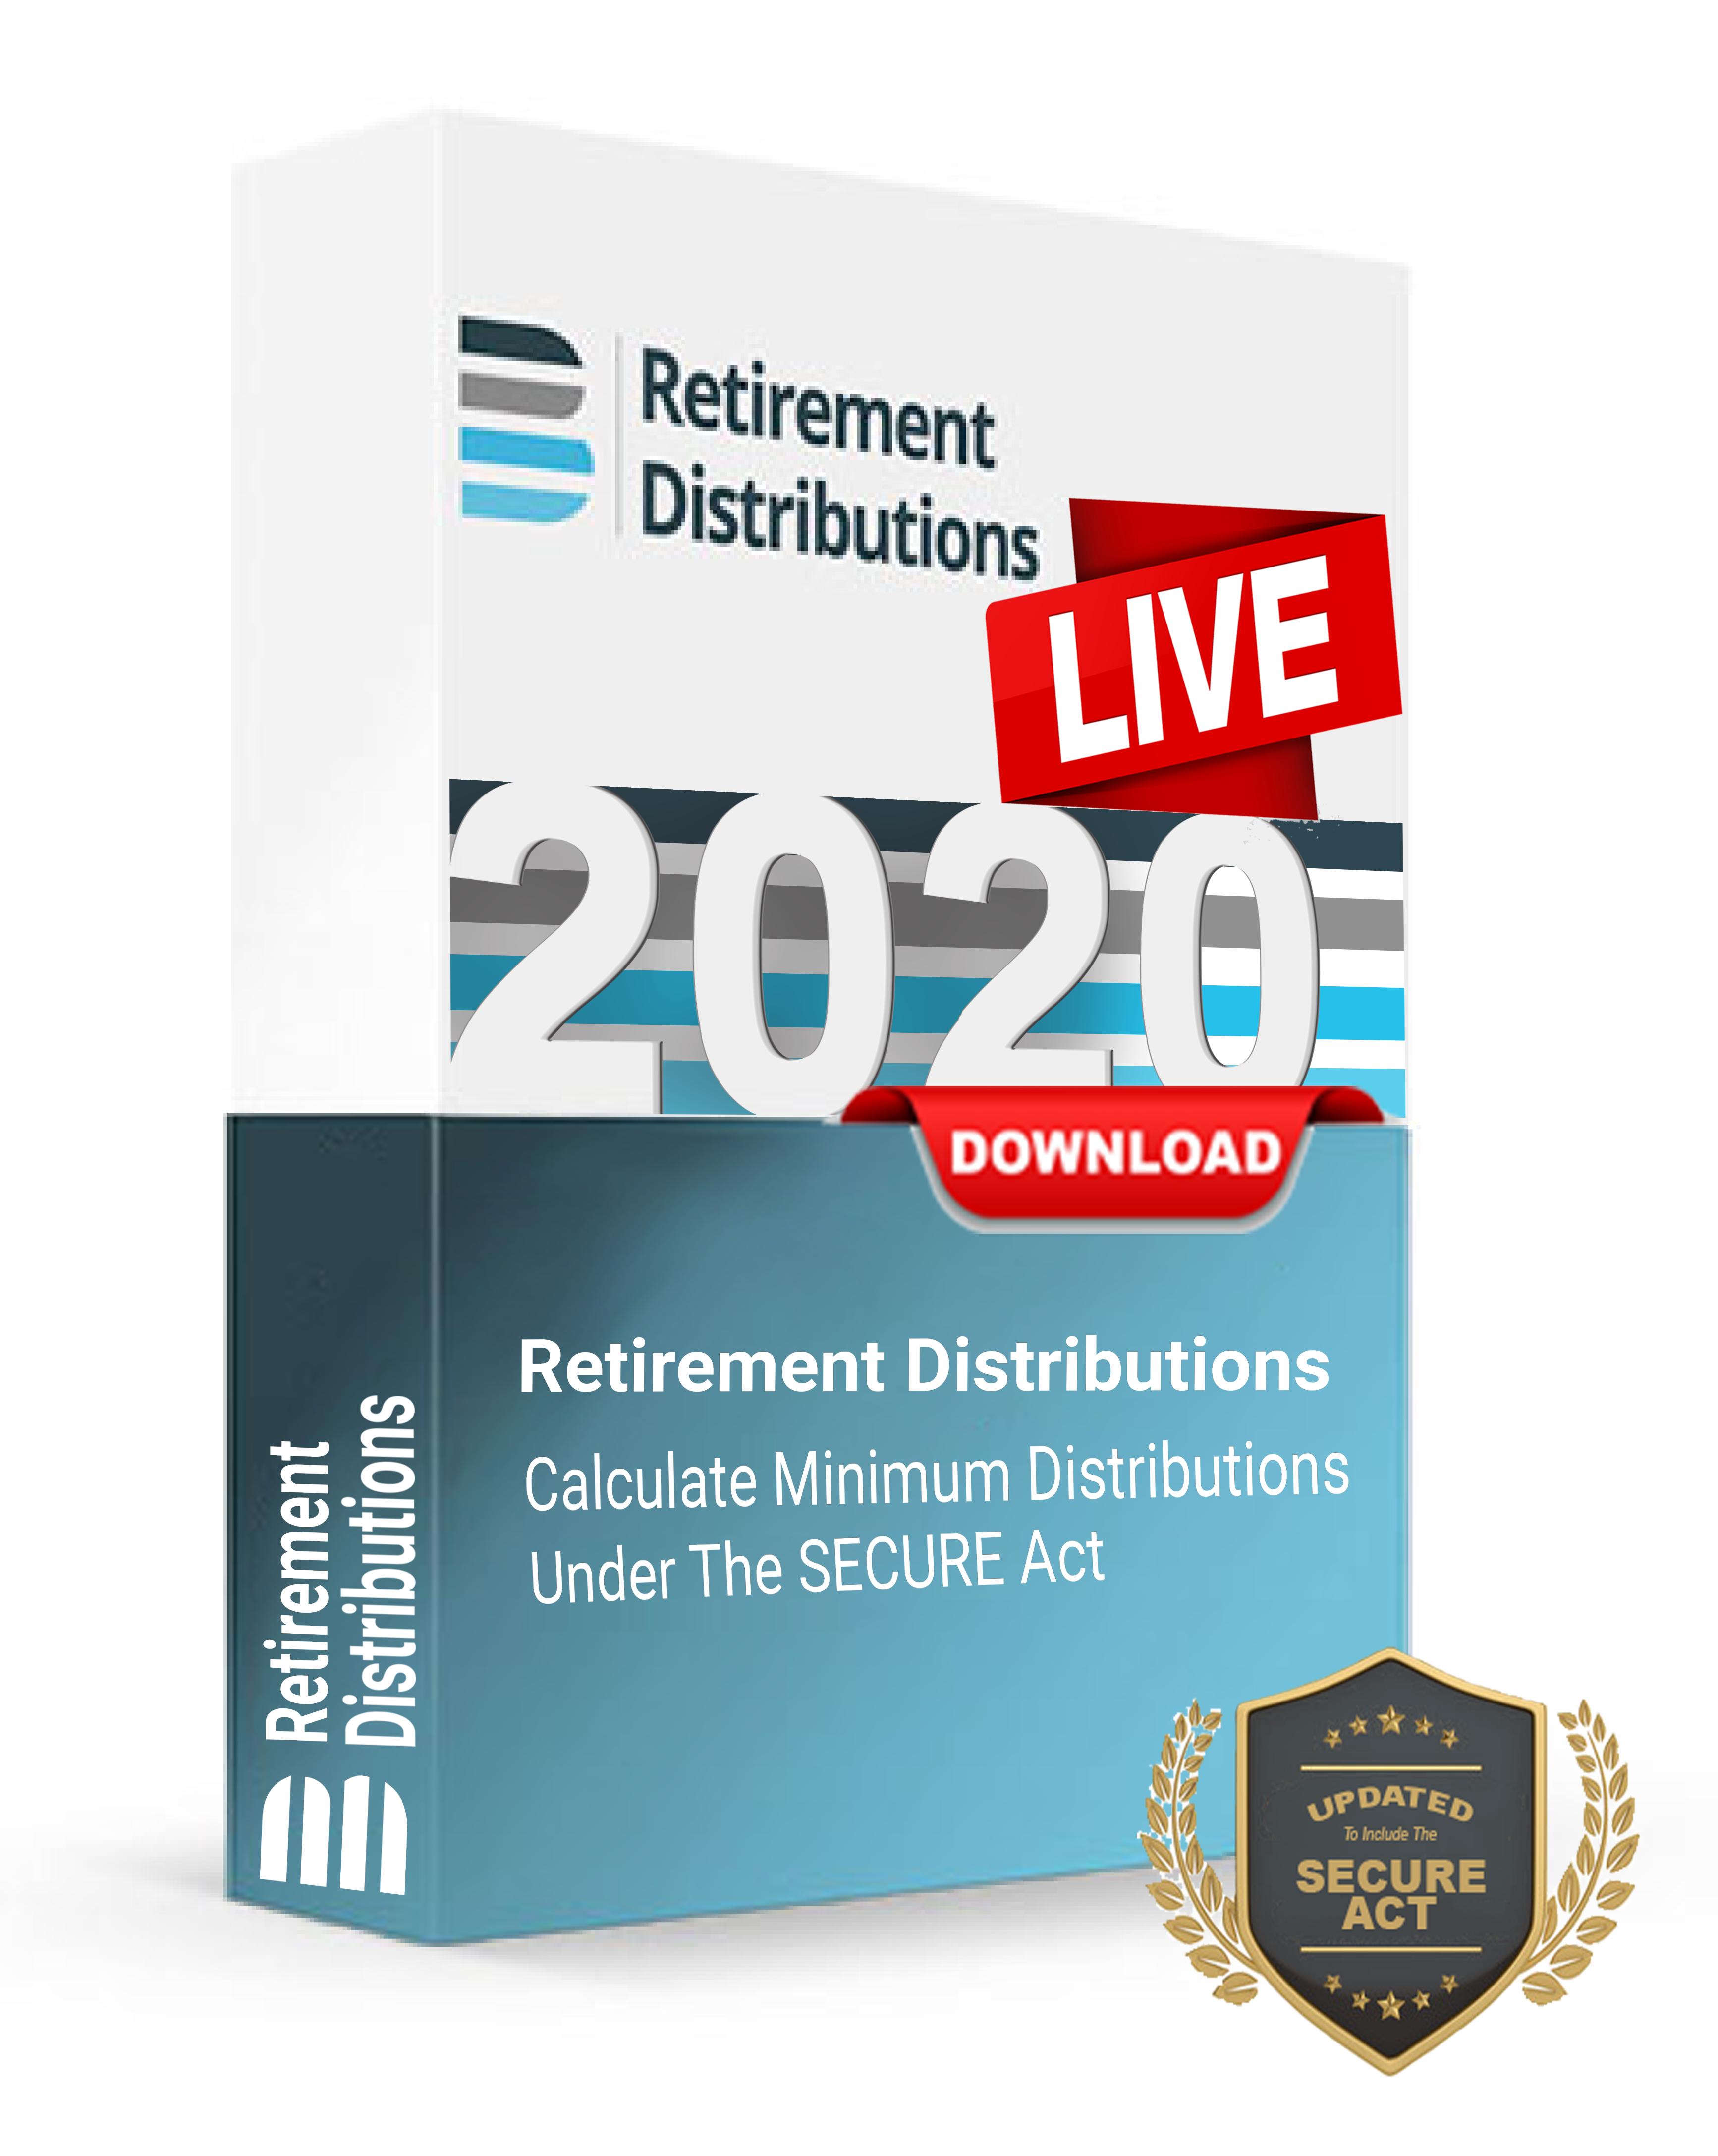 Retirement Distributions LIVE